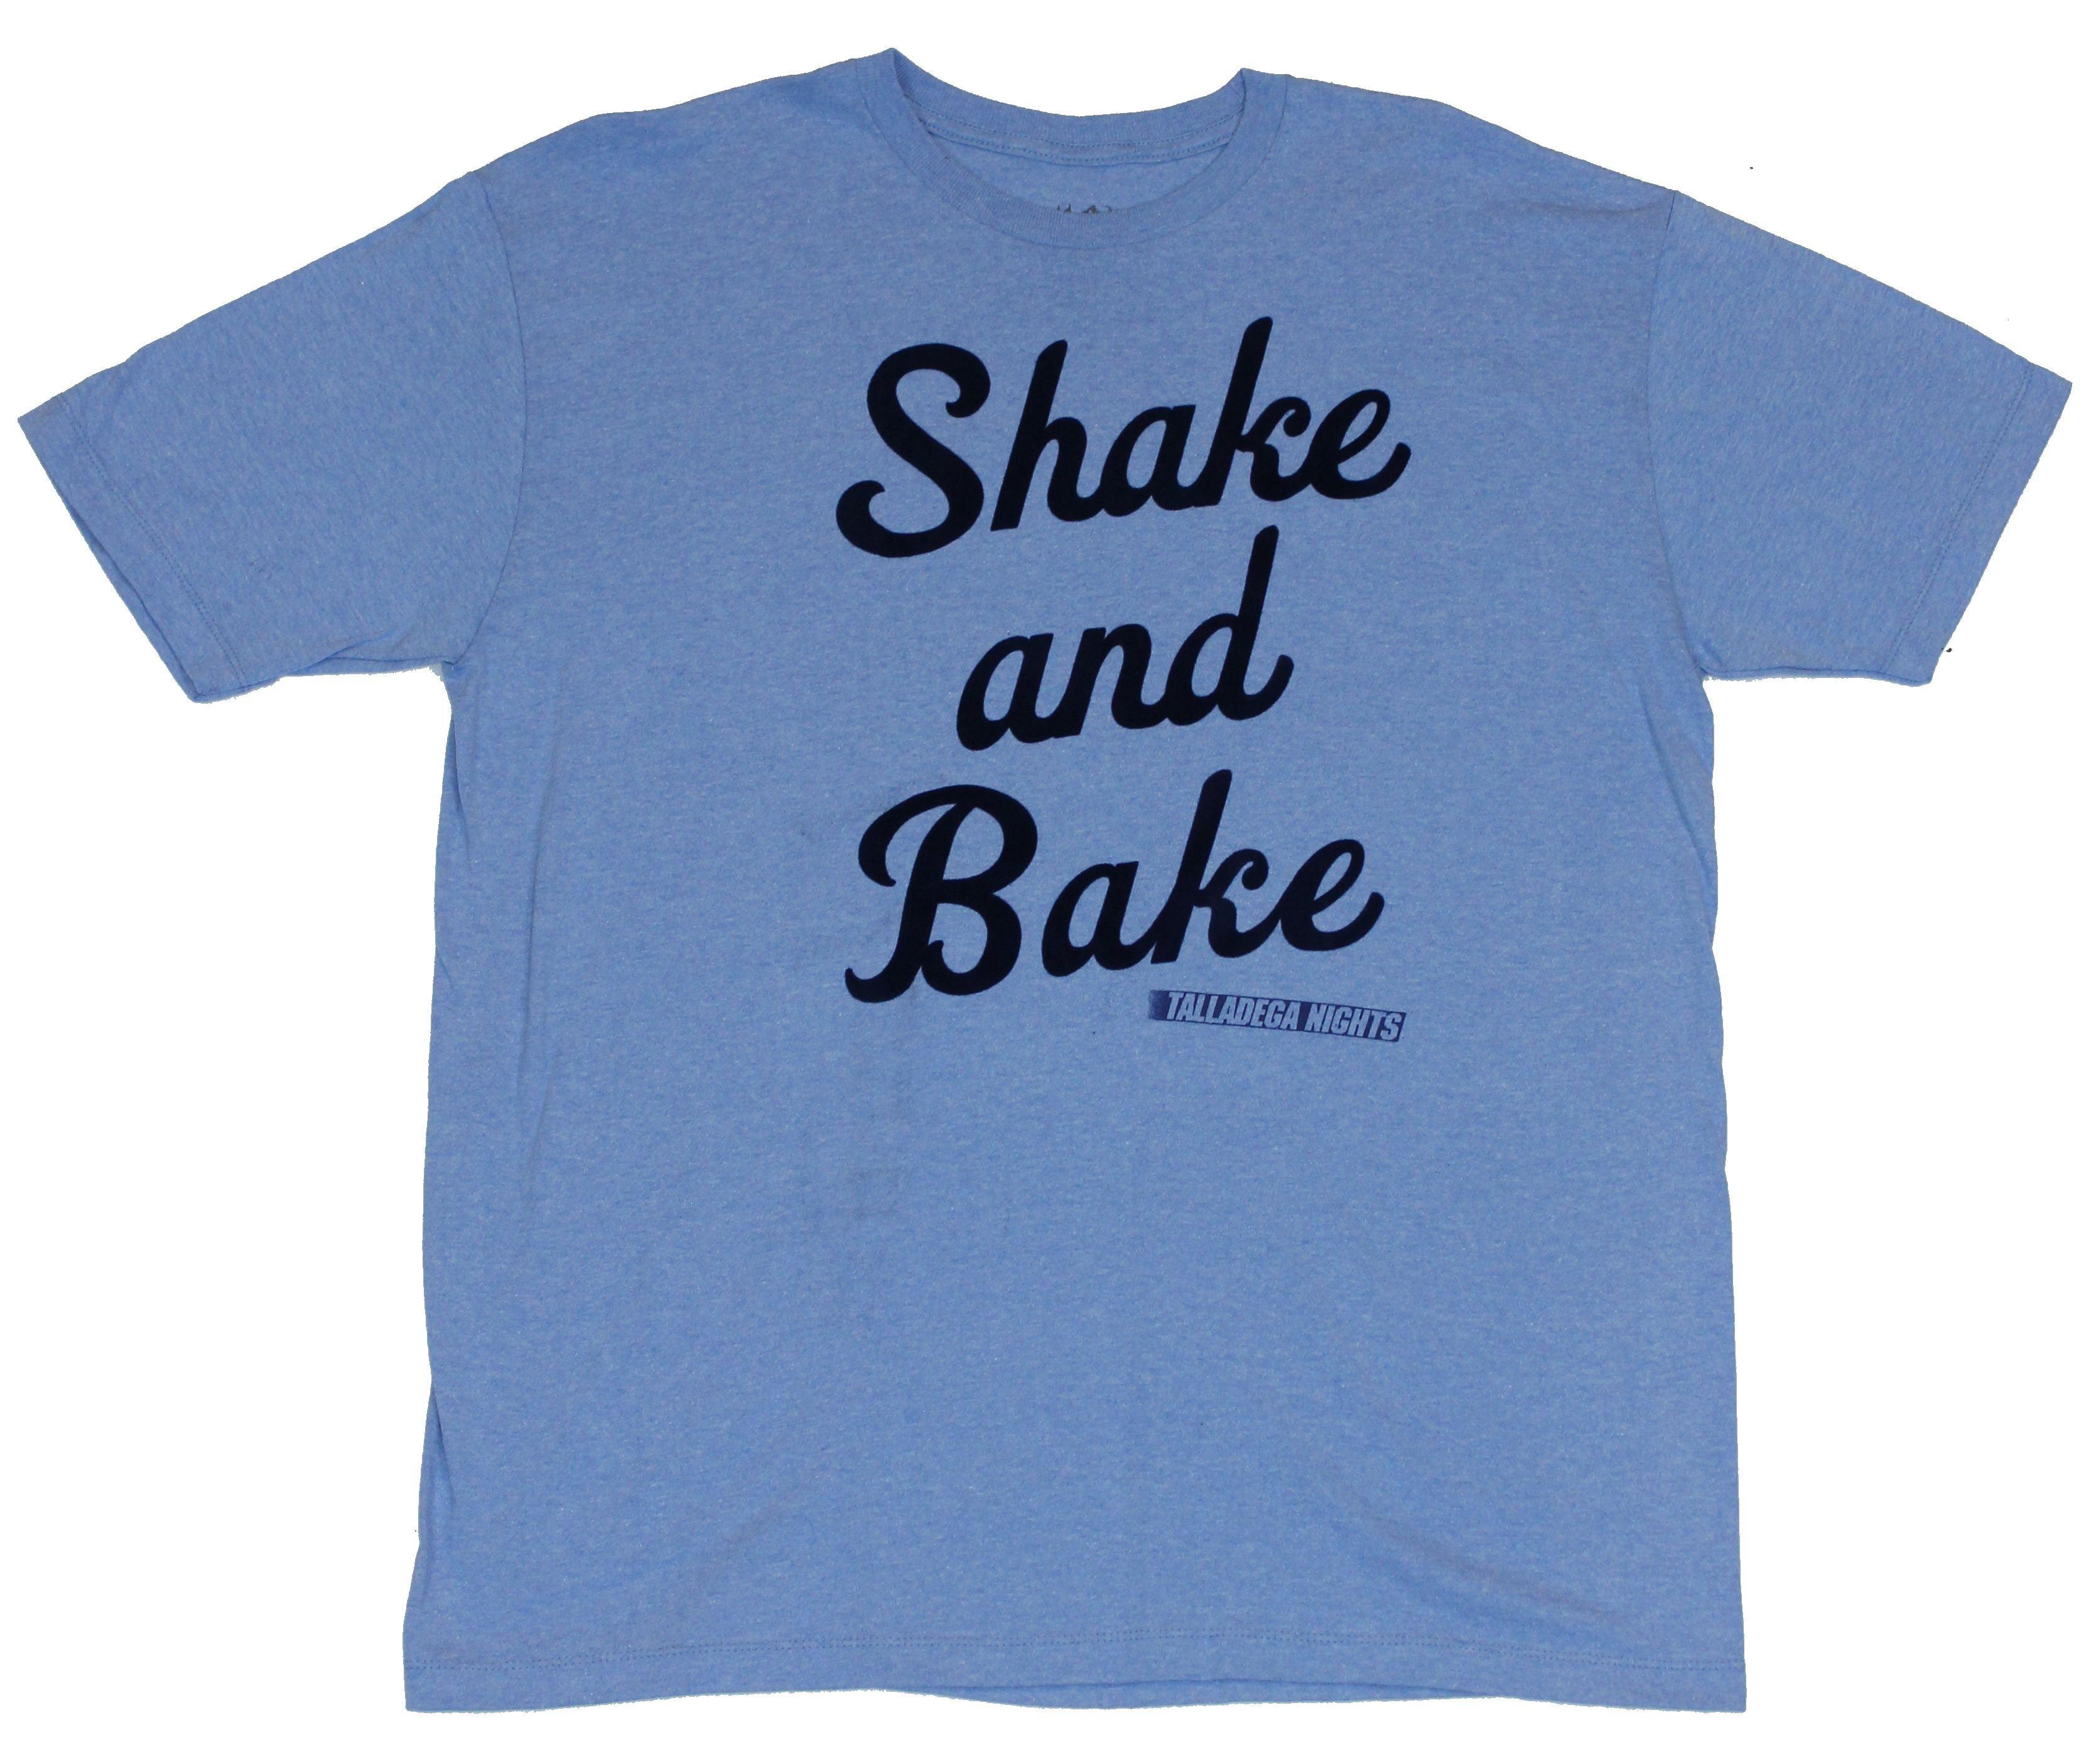 6a129b817 Talladega Nights - Talladega Nights Mens T-Shirt - Shake and Bake Raised  Felt Image - Walmart.com